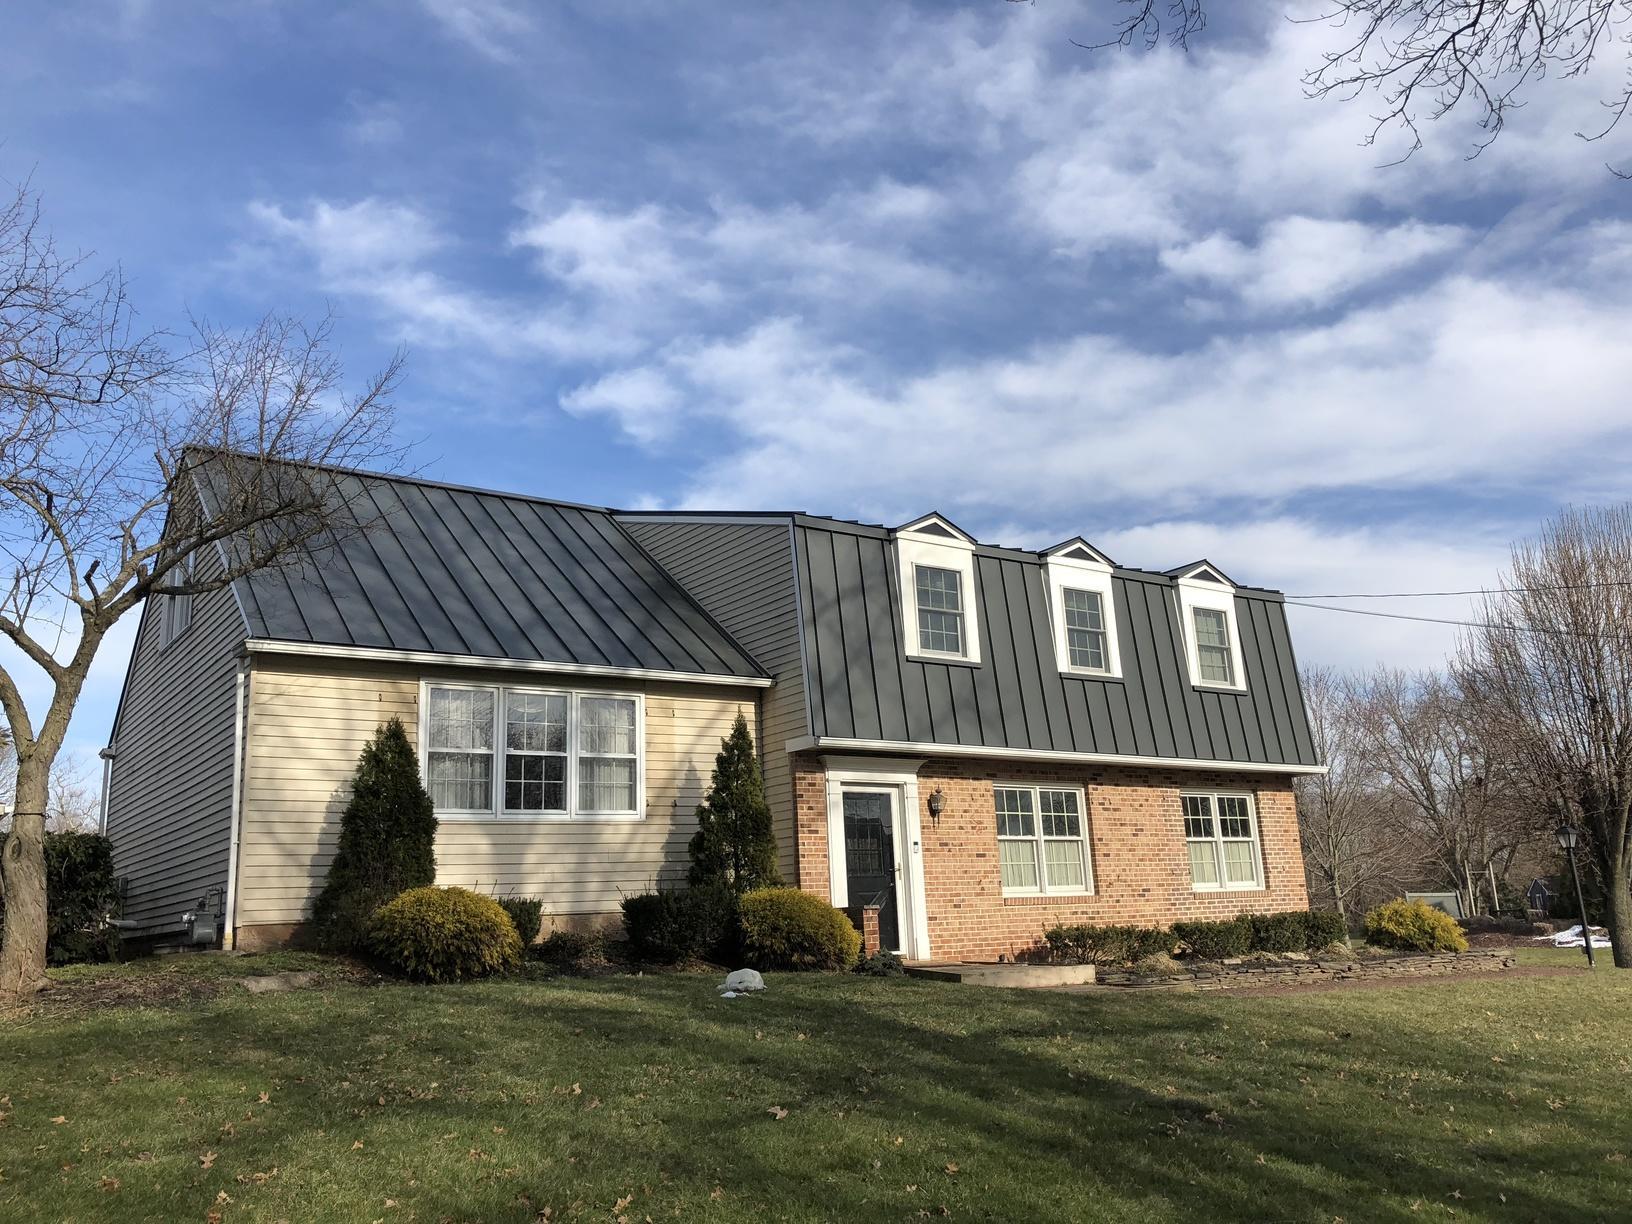 Grey Standing Seam Metal Roof on Steep-Sloped Roof